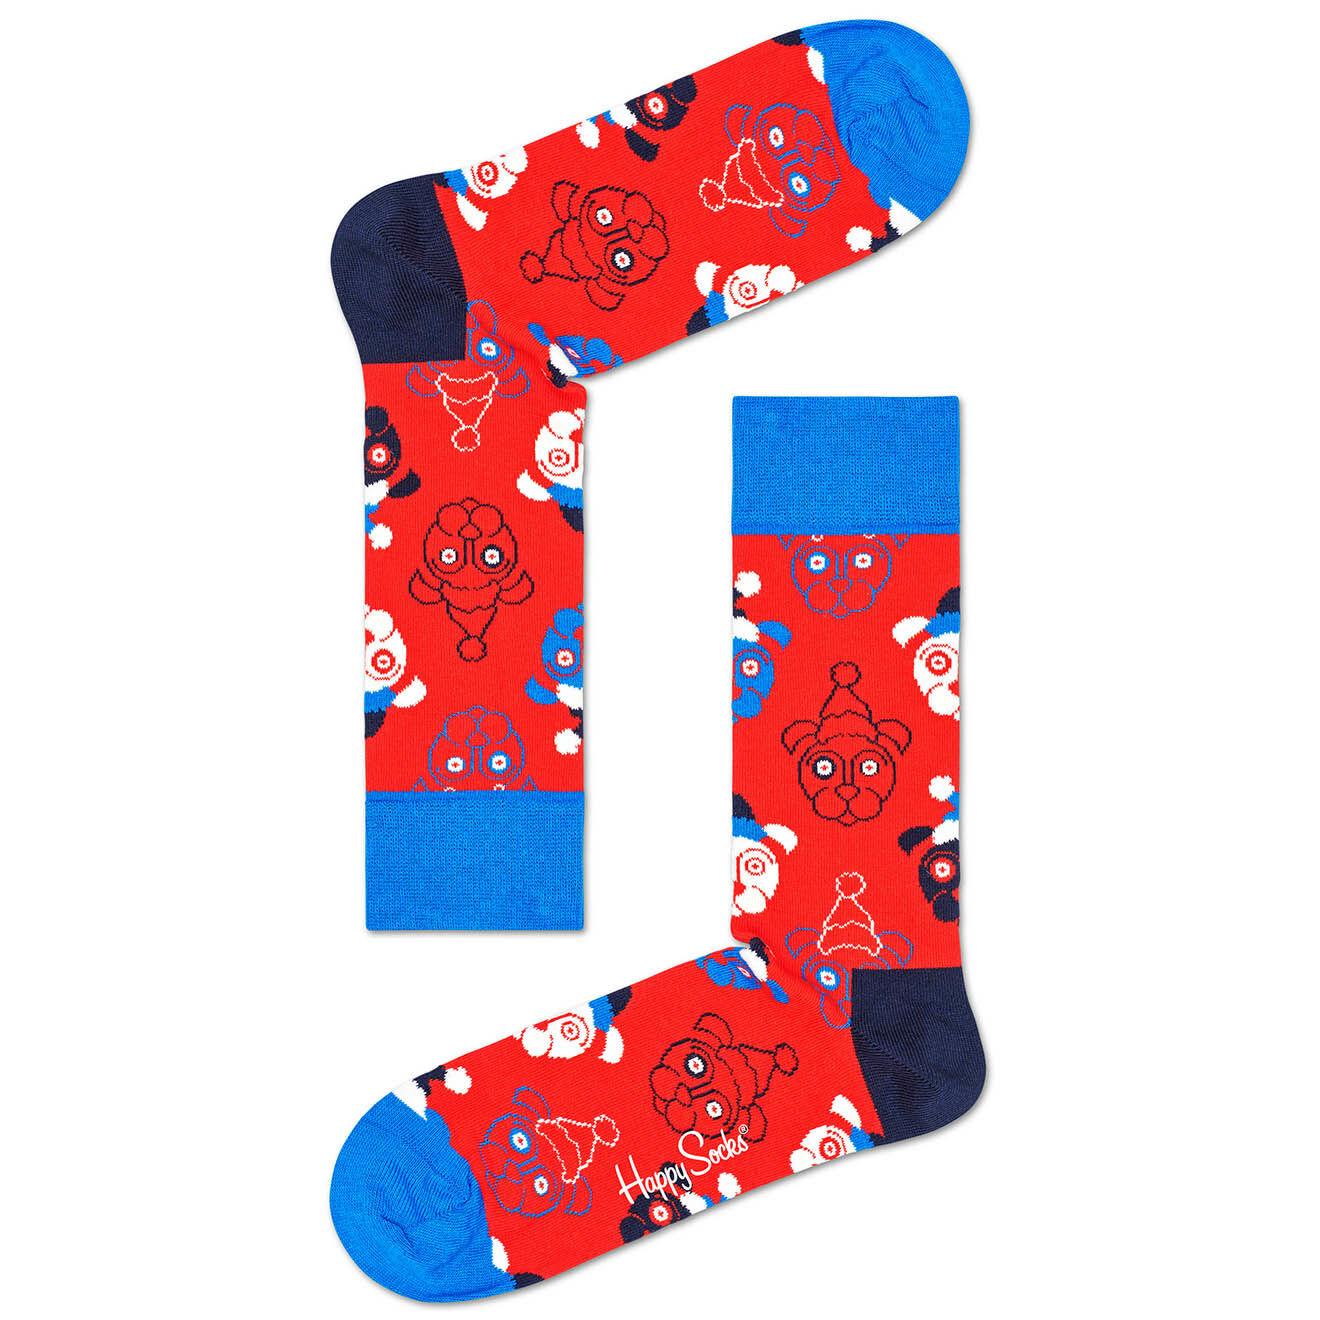 Chaussettes Santa Dog rouge/bleu/ - Happy socks - Modalova